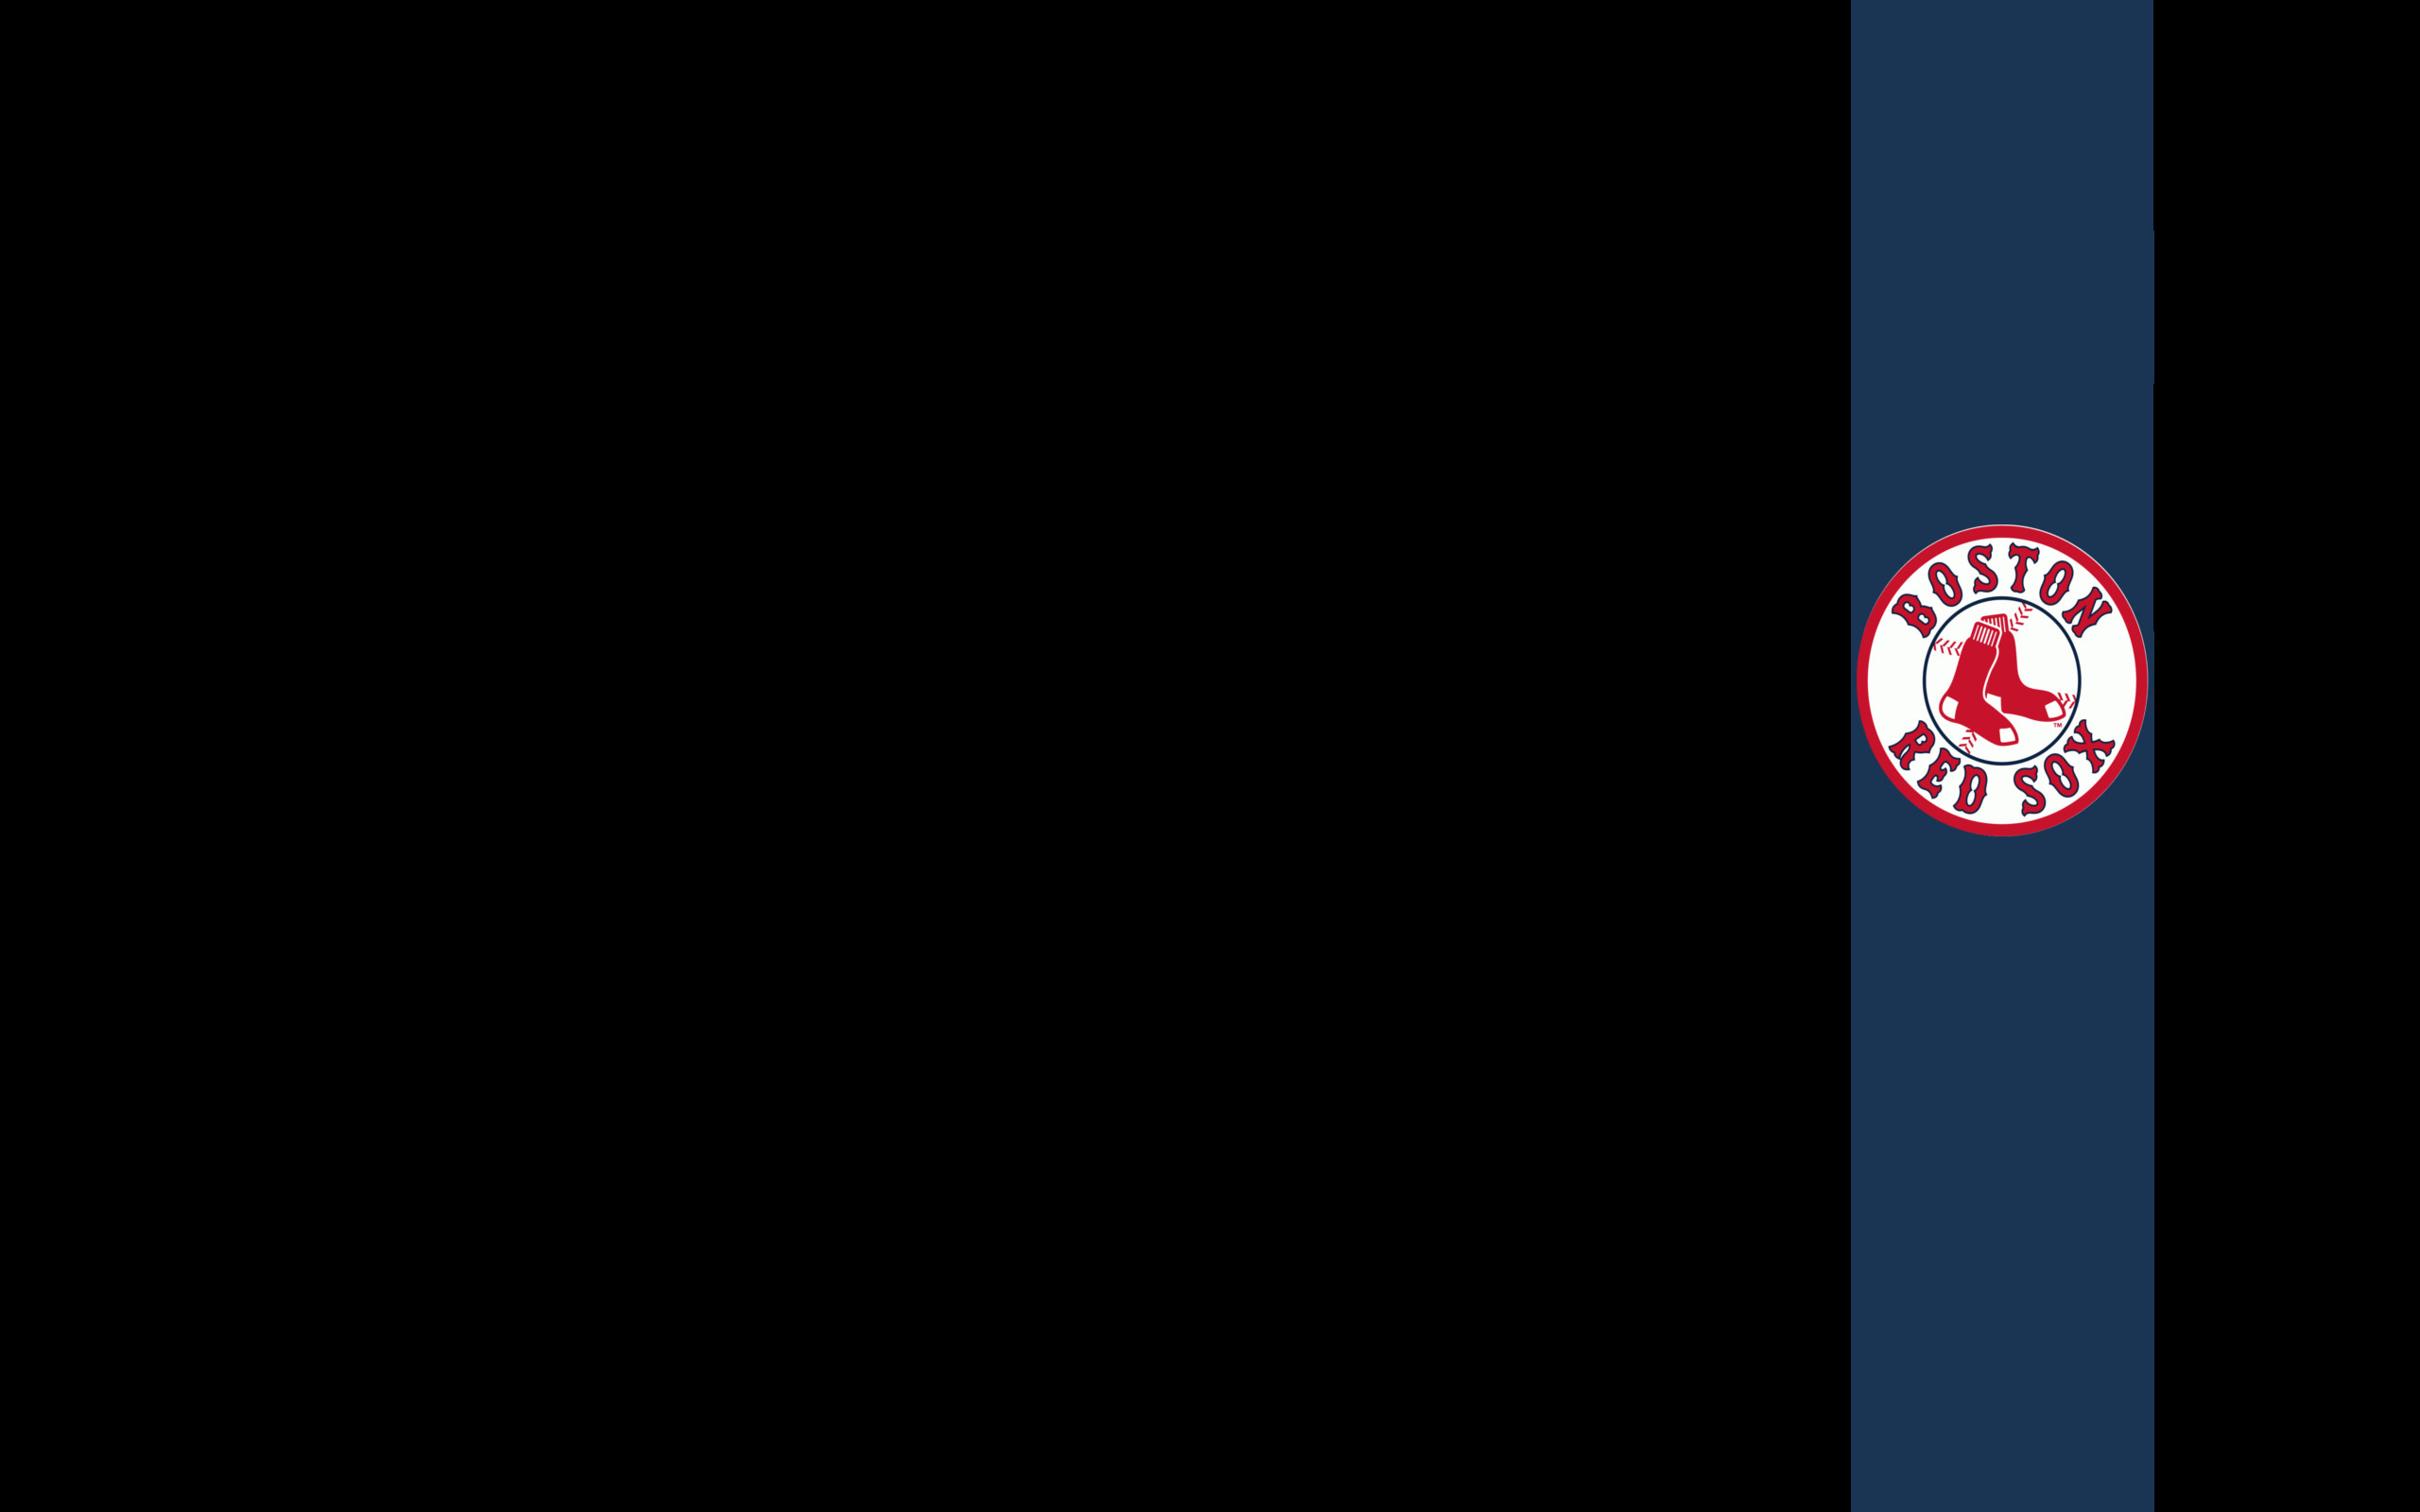 Boston Red Sox Wallpaper Screensavers 2560×1600